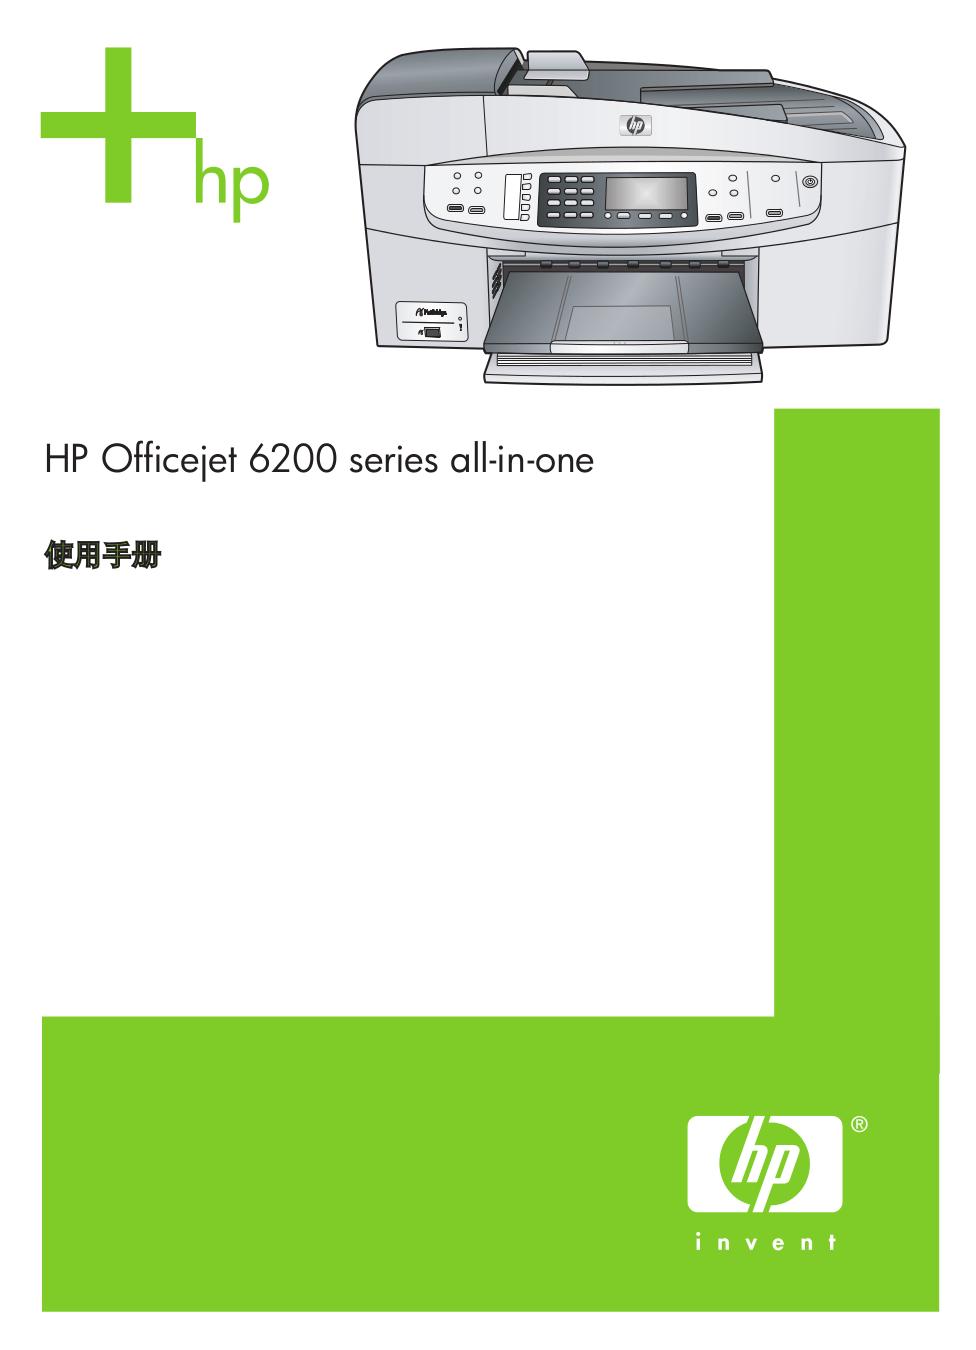 pdf for HP Multifunction Printer Officejet 6200 manual